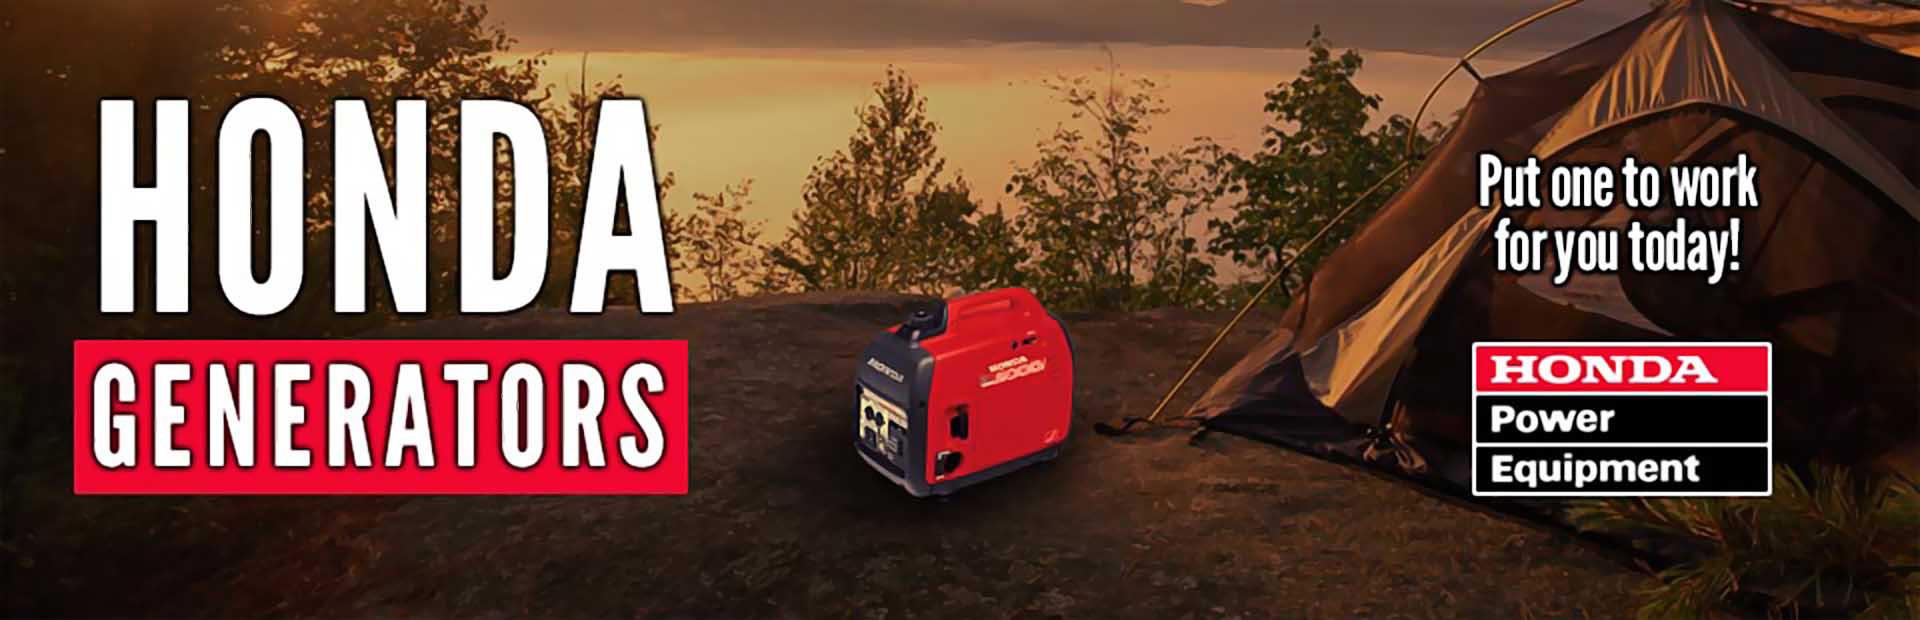 Honda Generators: Click here to view the models.